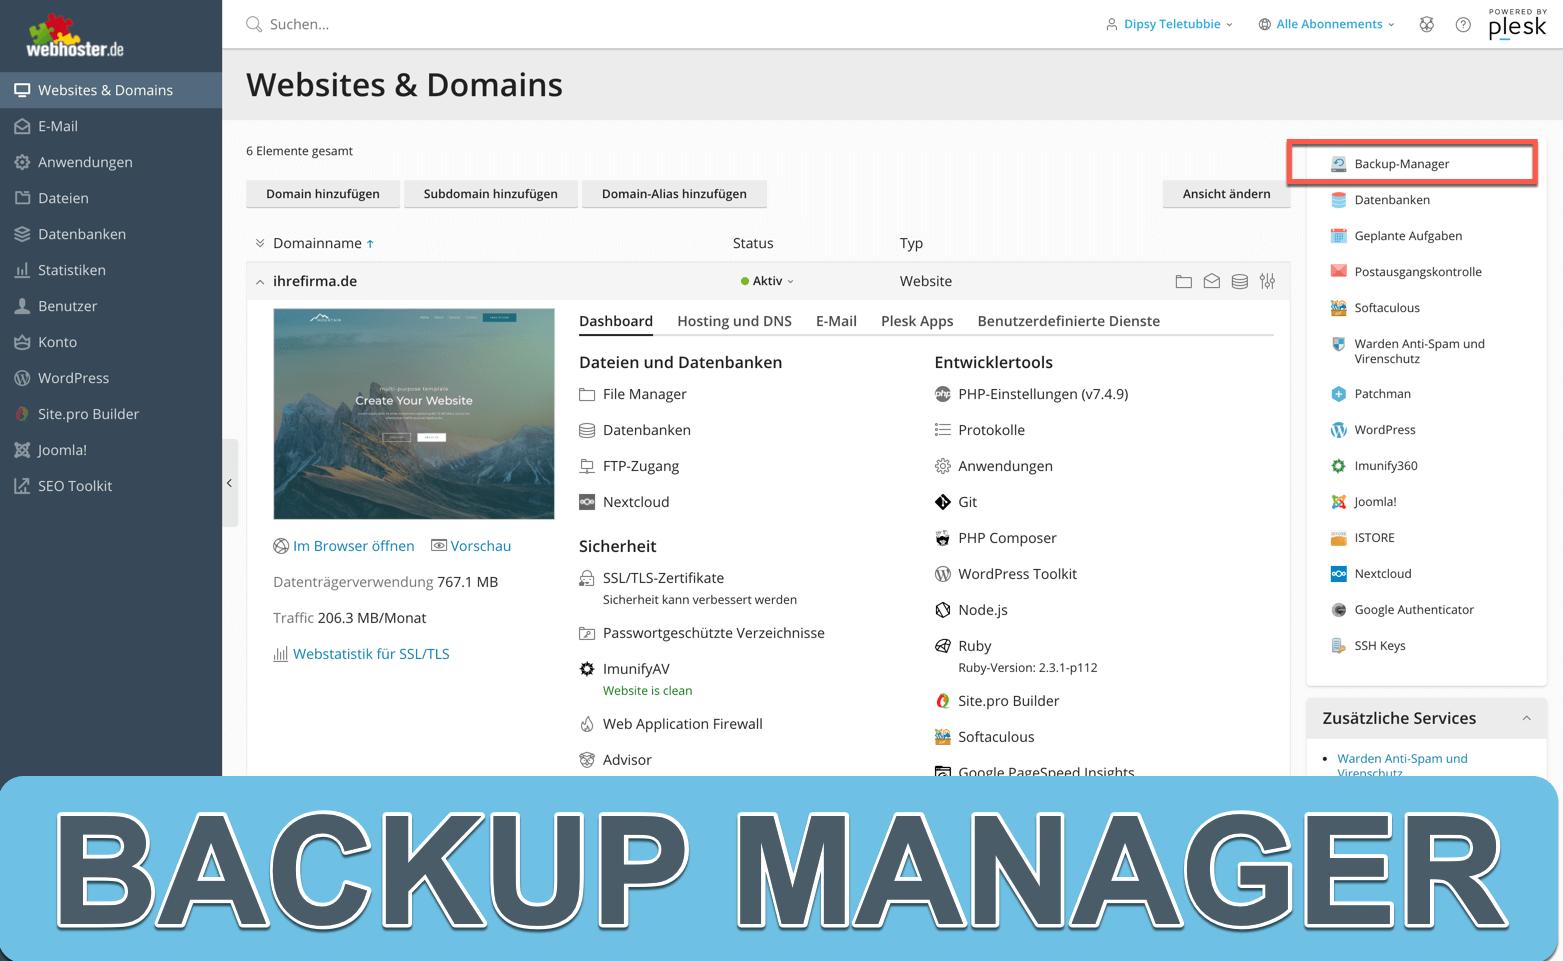 Backup Manager